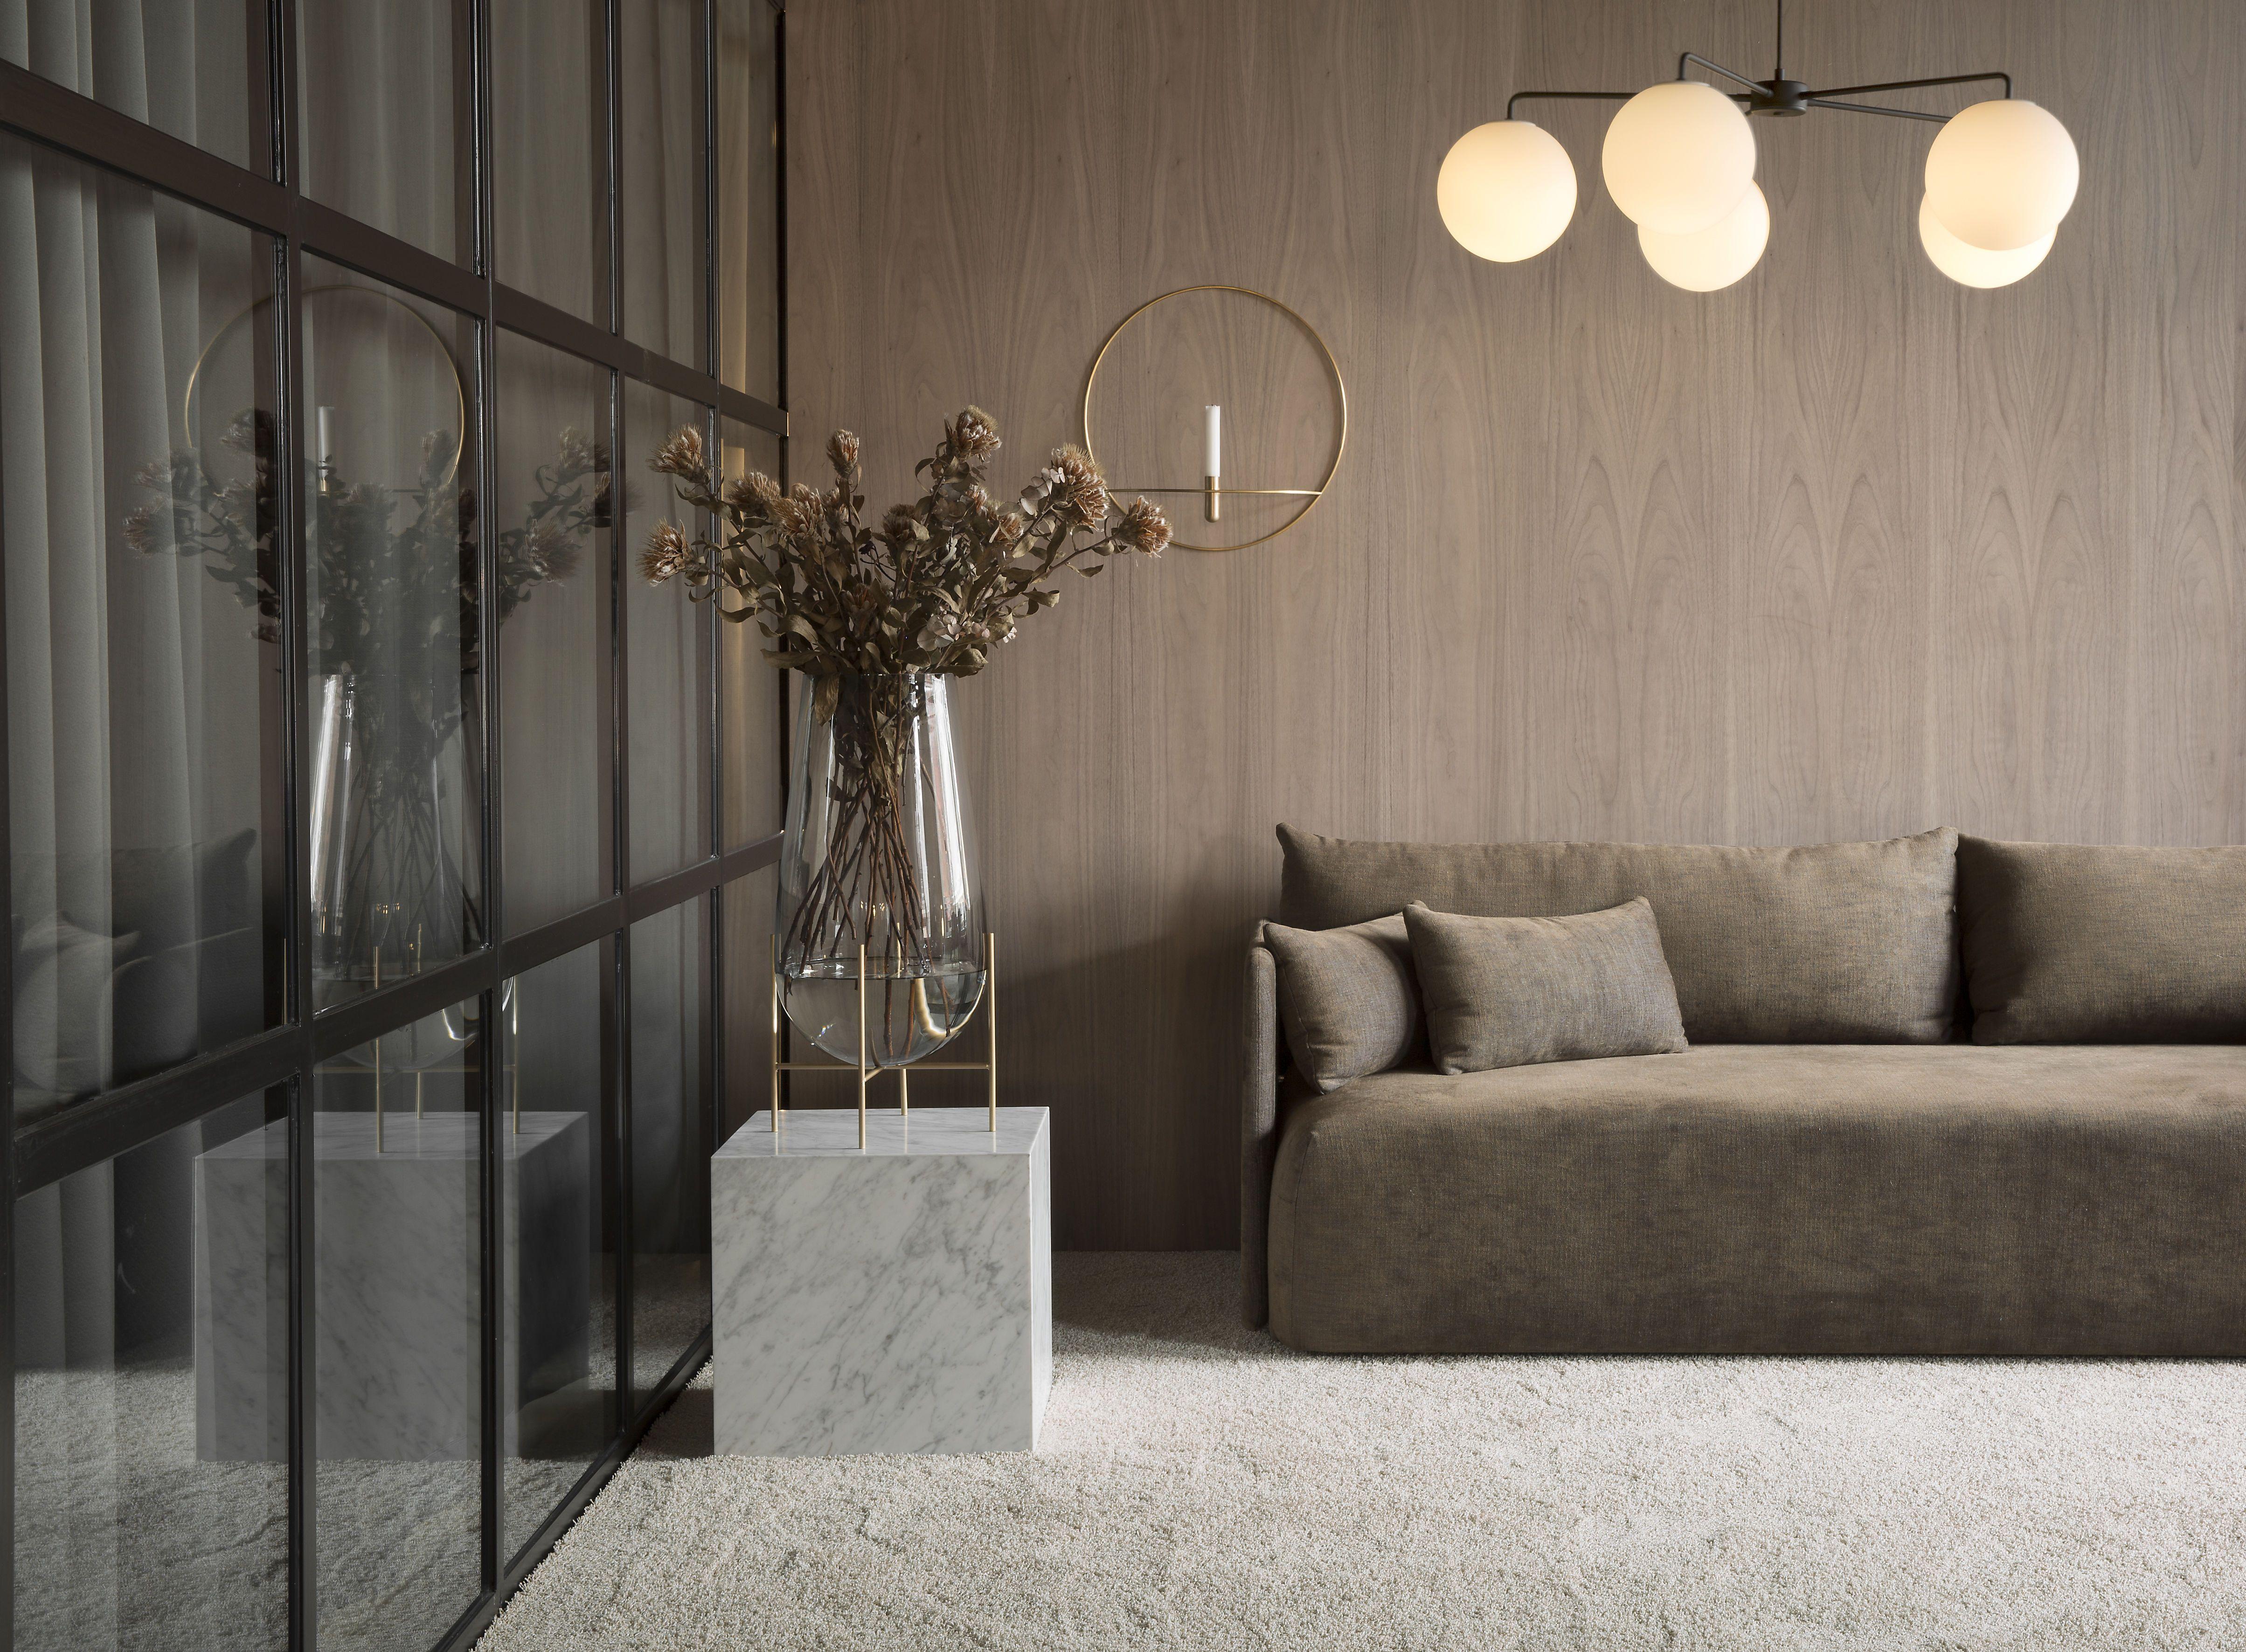 MENU SS18 | Offset Sofa, Plinth, Echasse Vase | Haus deko